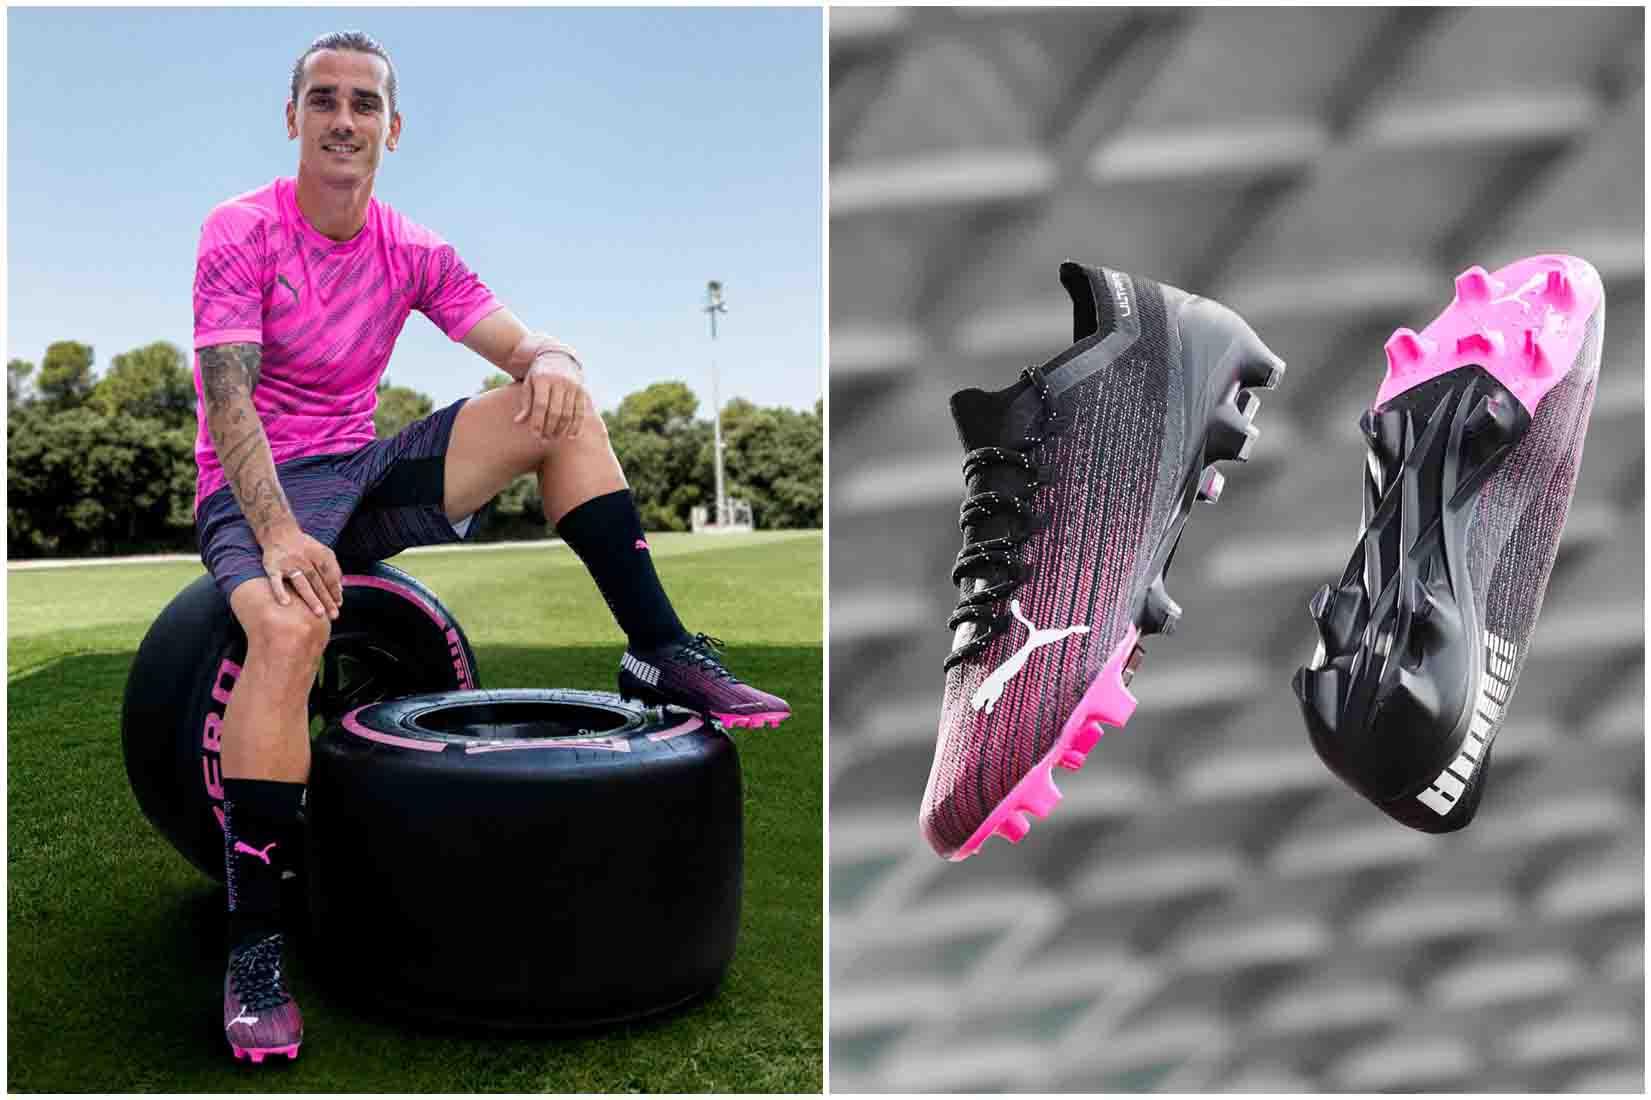 Antoine Griezmann mang giày đá banh Puma Ultra 1.1